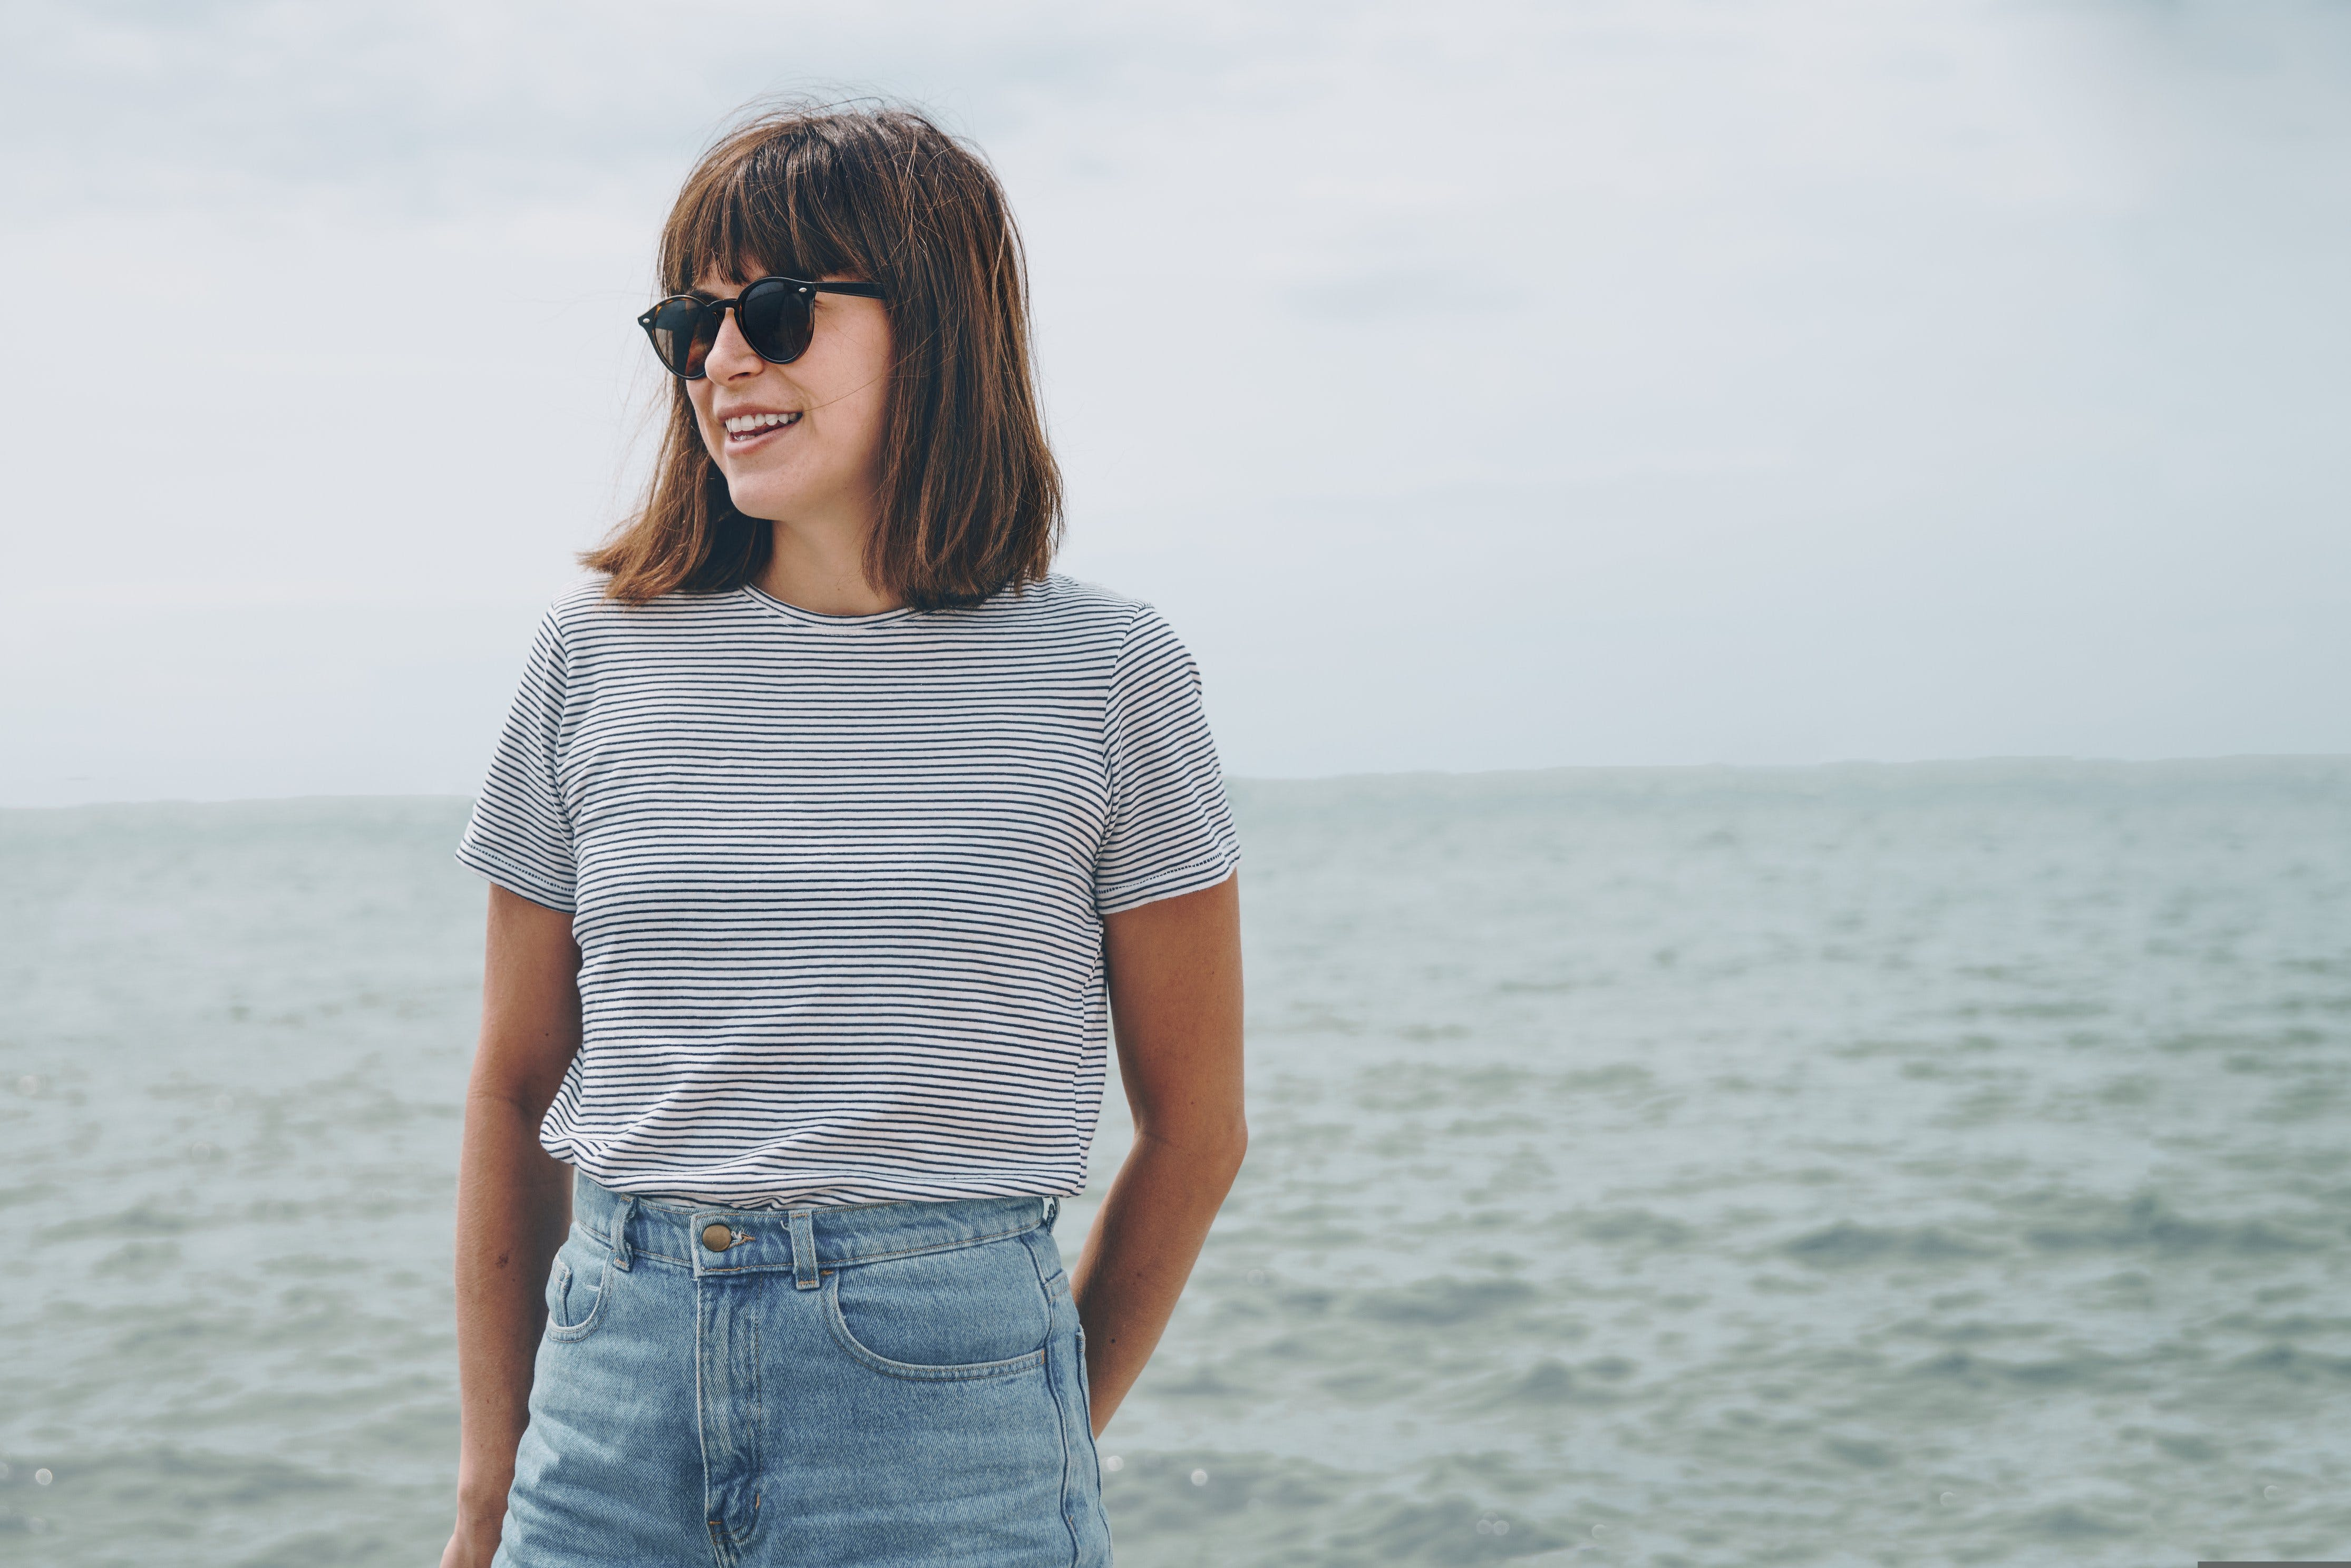 Woman Standing Near Sea While Wearing Black Frame Sunglasses